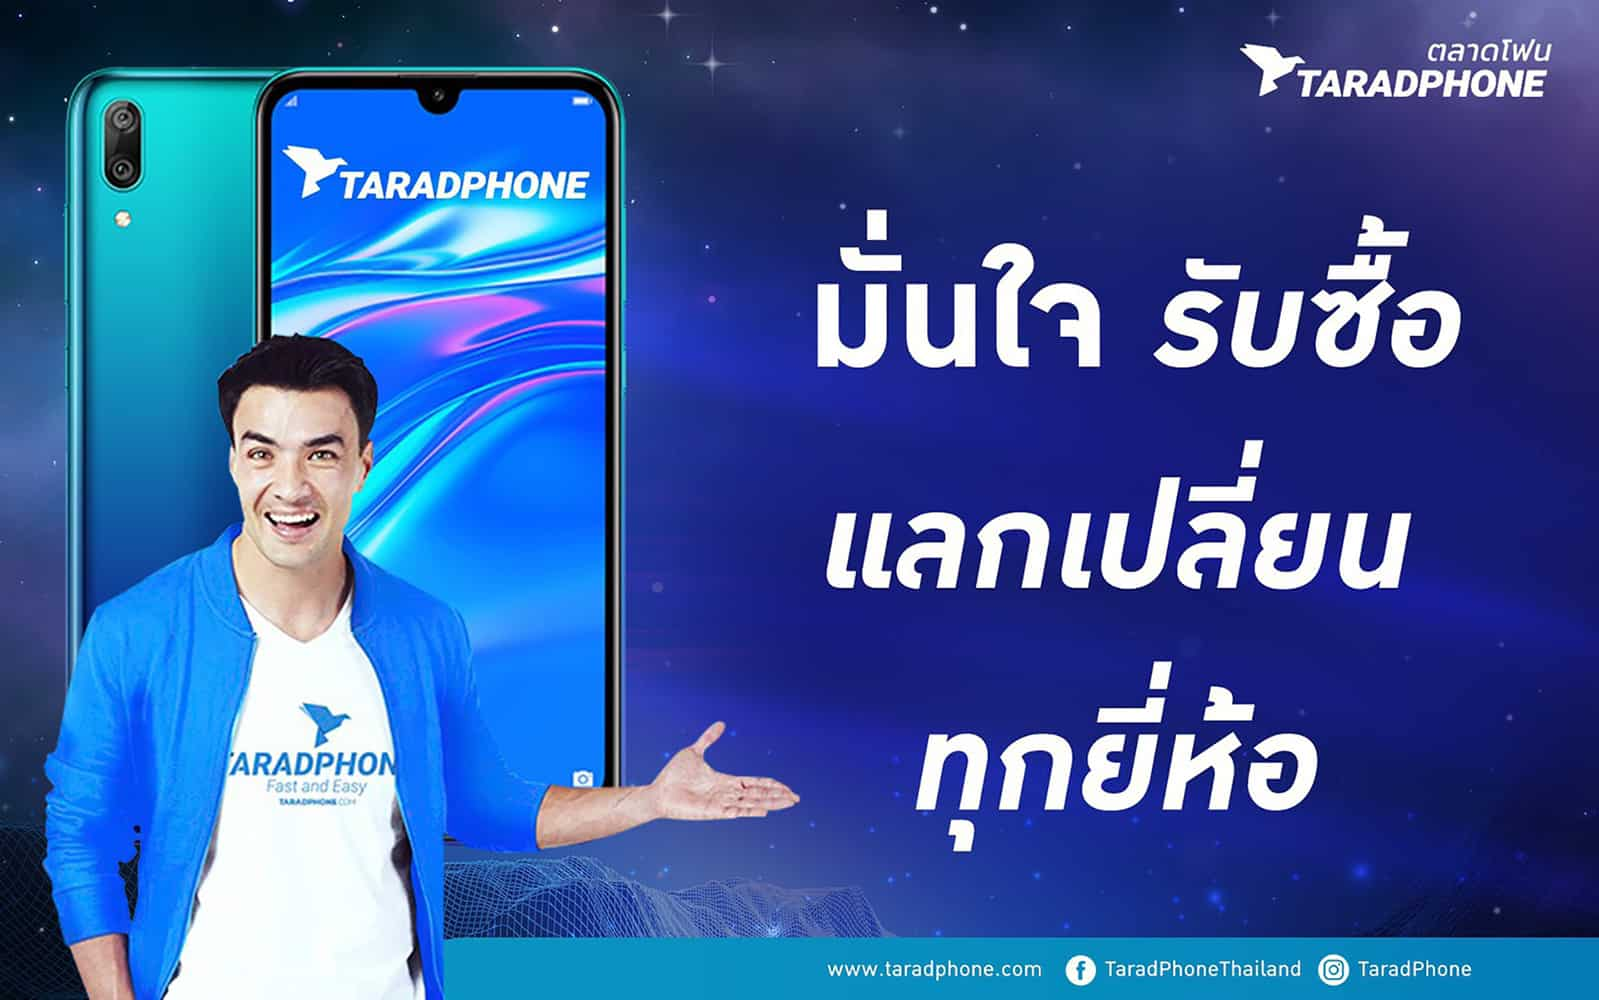 taradphone munjai 3 - Taradphone.com เร่งสร้างมาตรฐานตรวจเช็คคุณภาพ เพิ่มความมั่นใจลูกค้าทั่วประเทศ